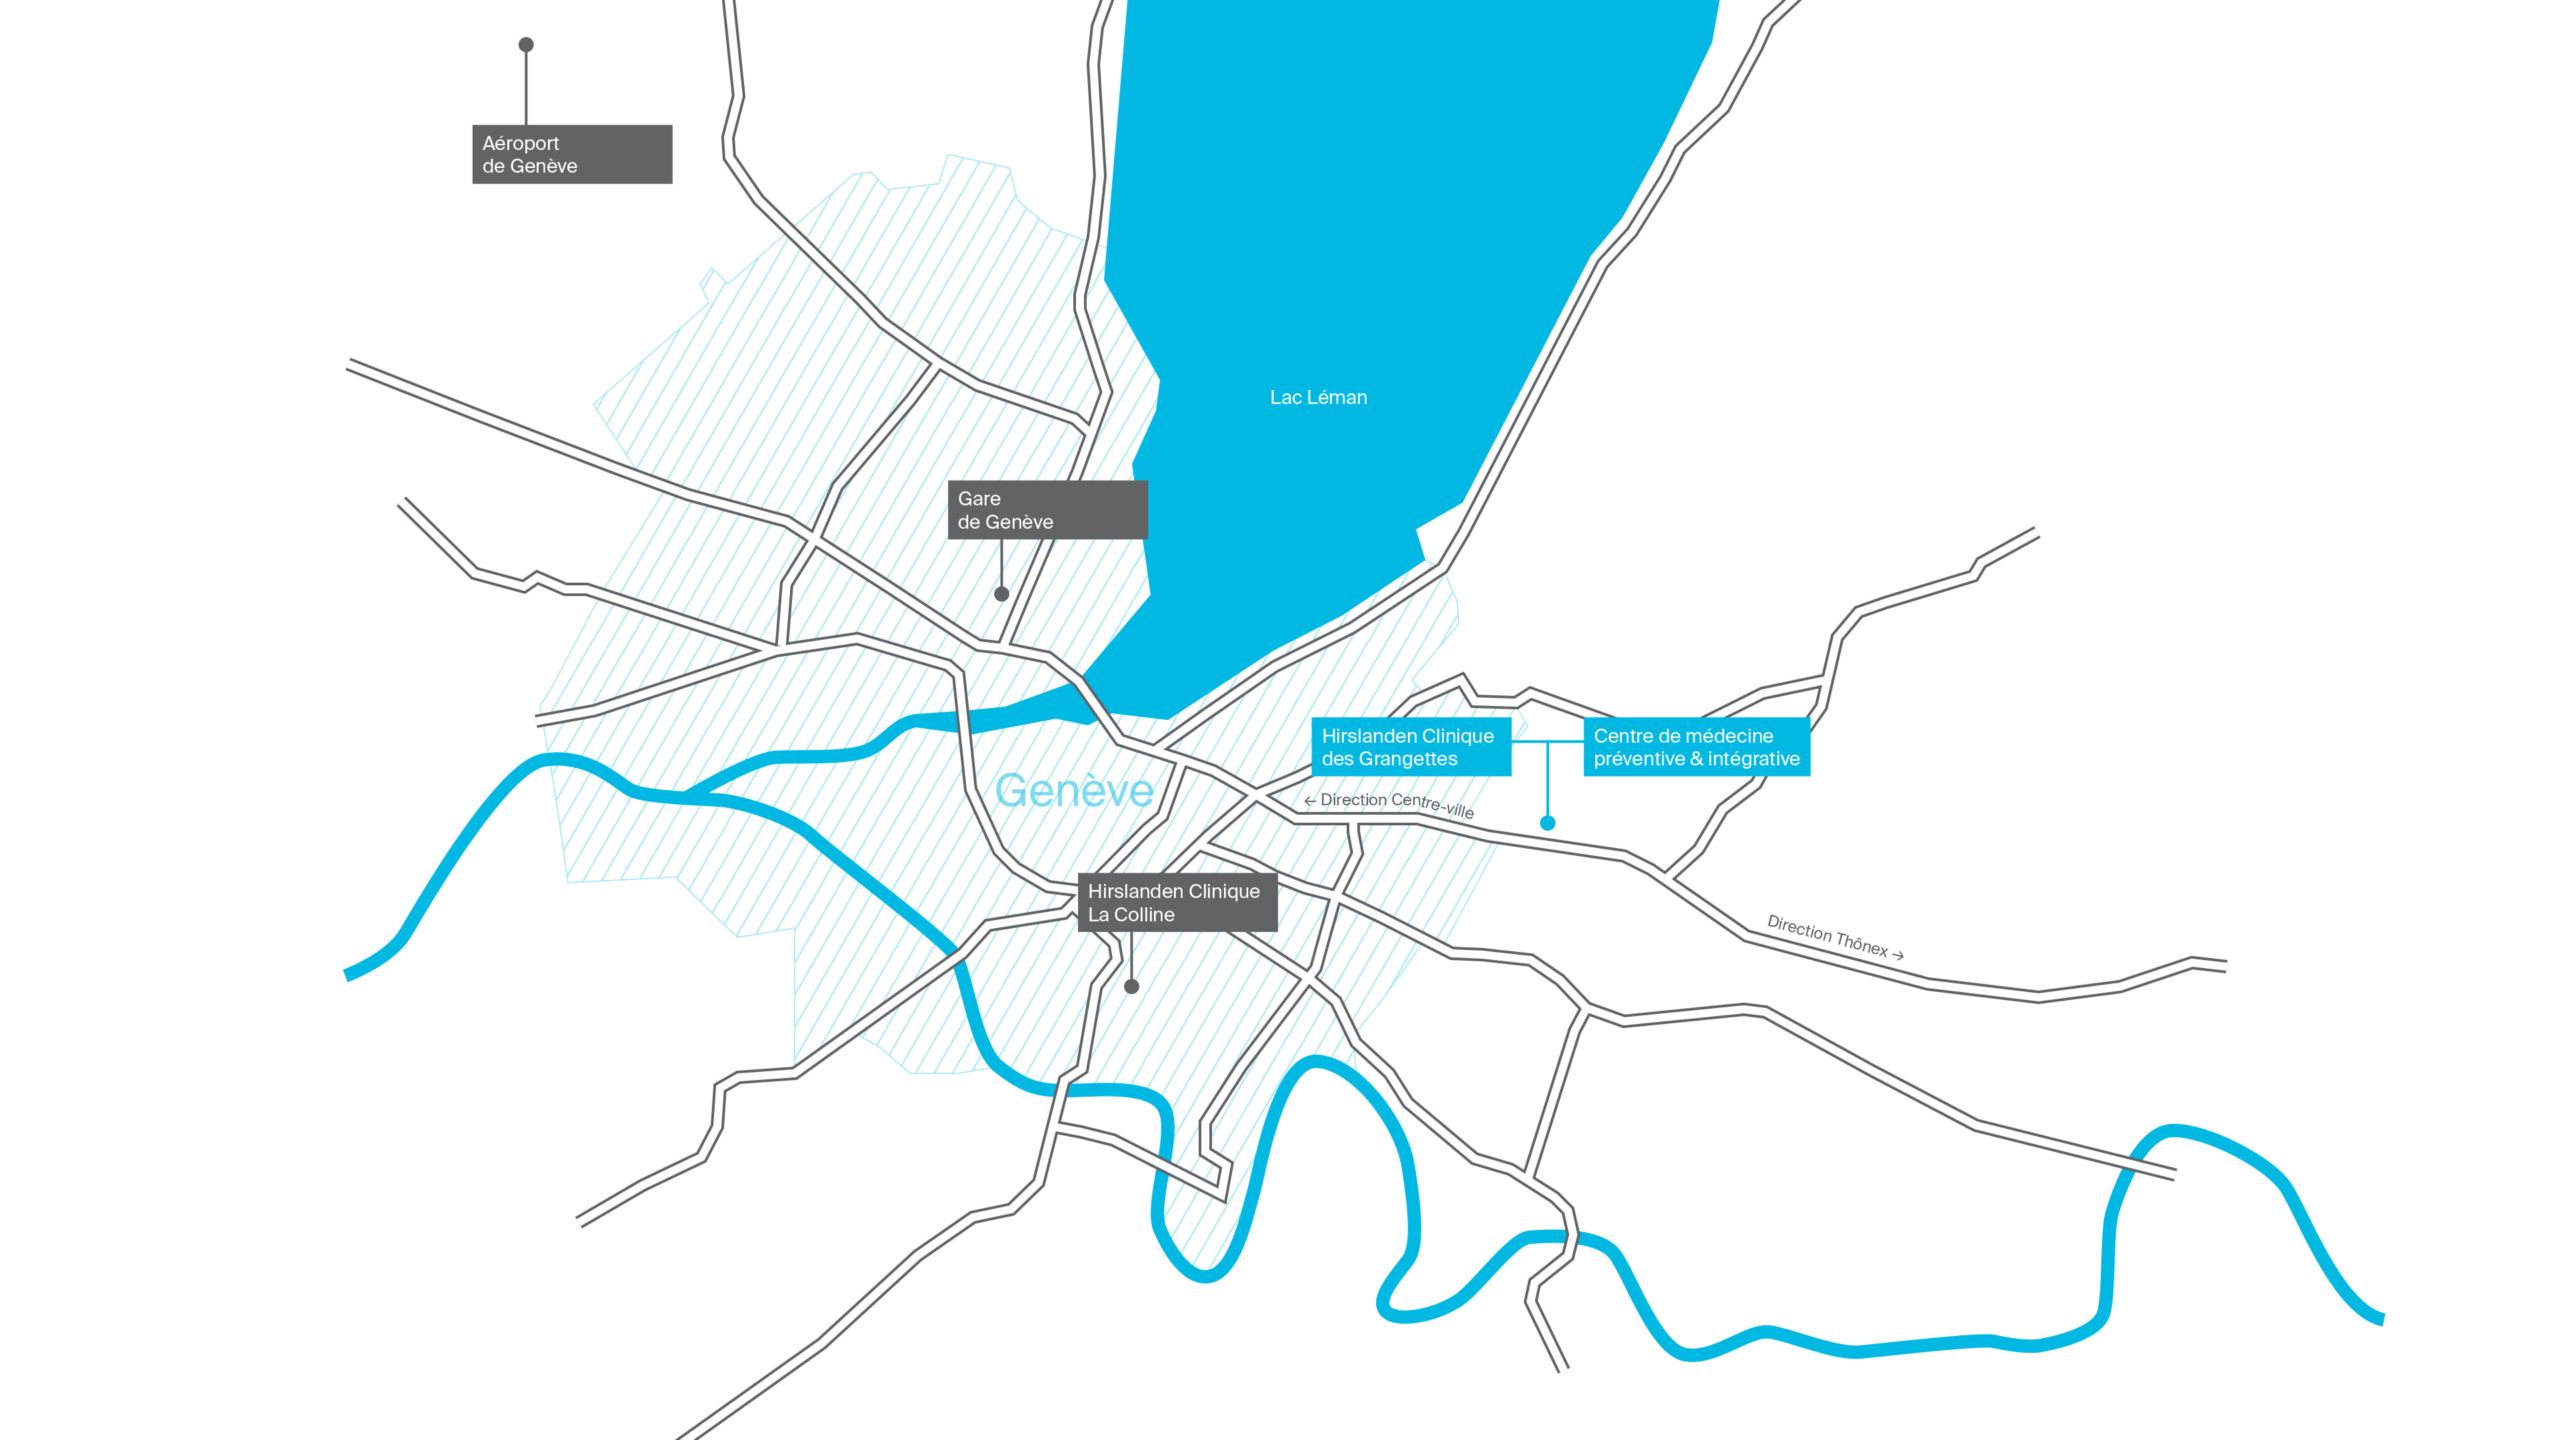 Plan de Genève